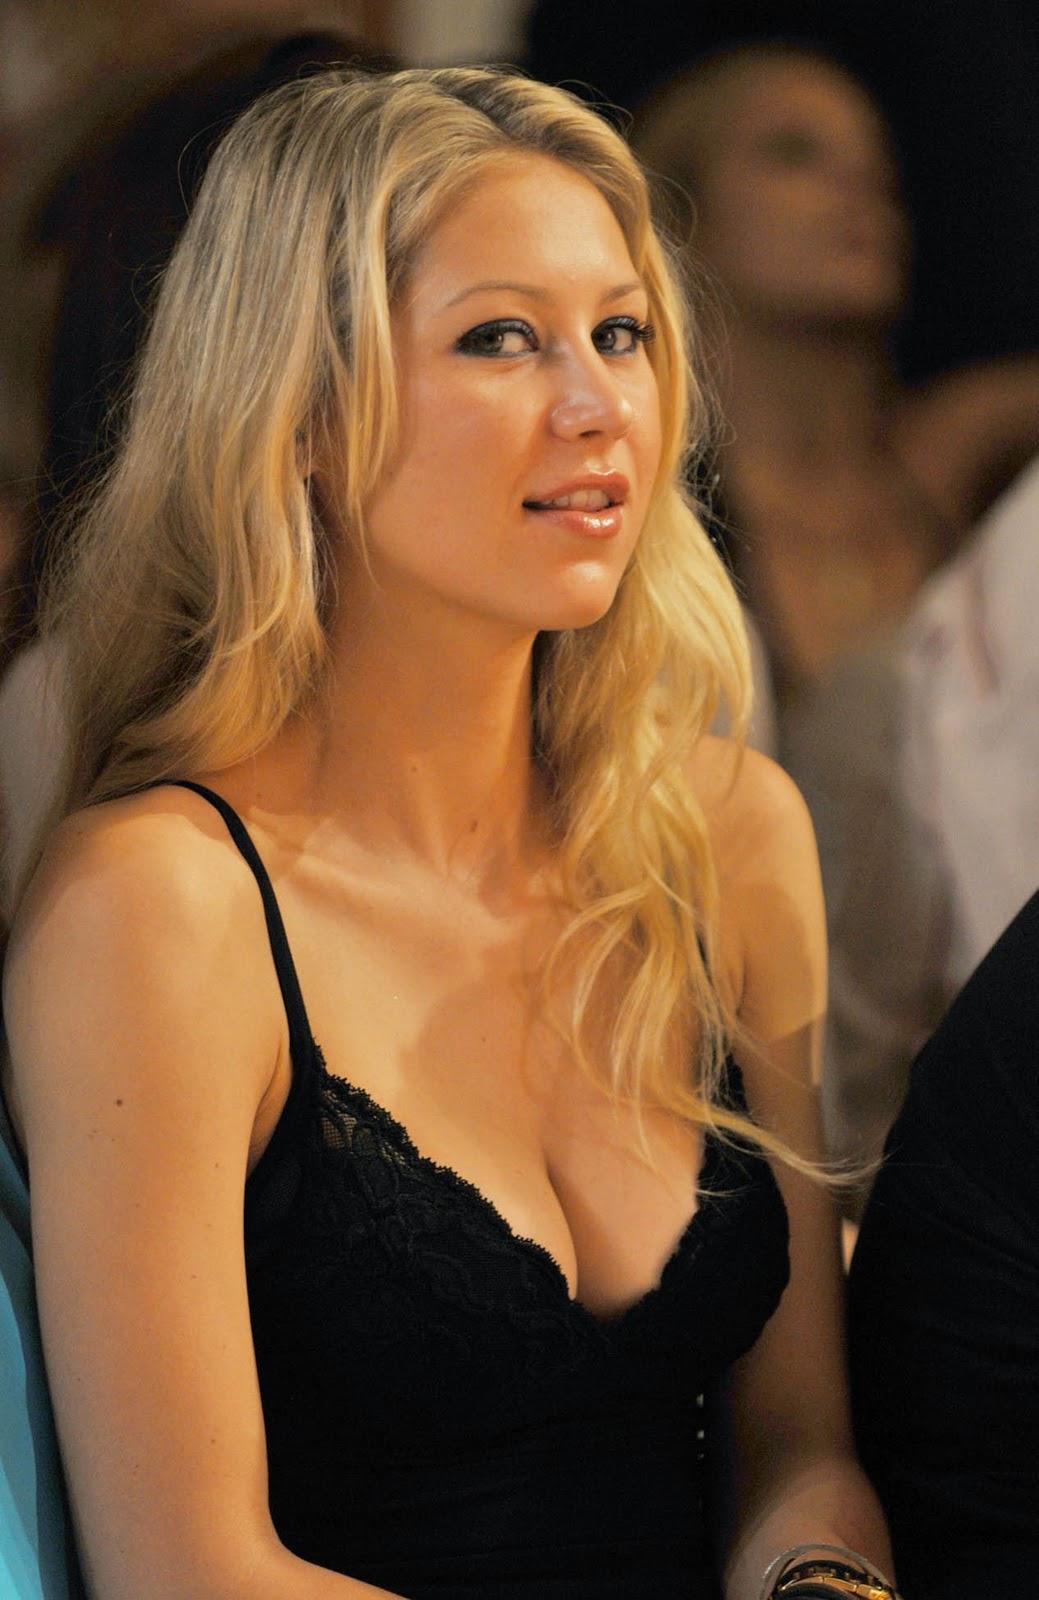 Cleavage Anna Kournikova nude photos 2019